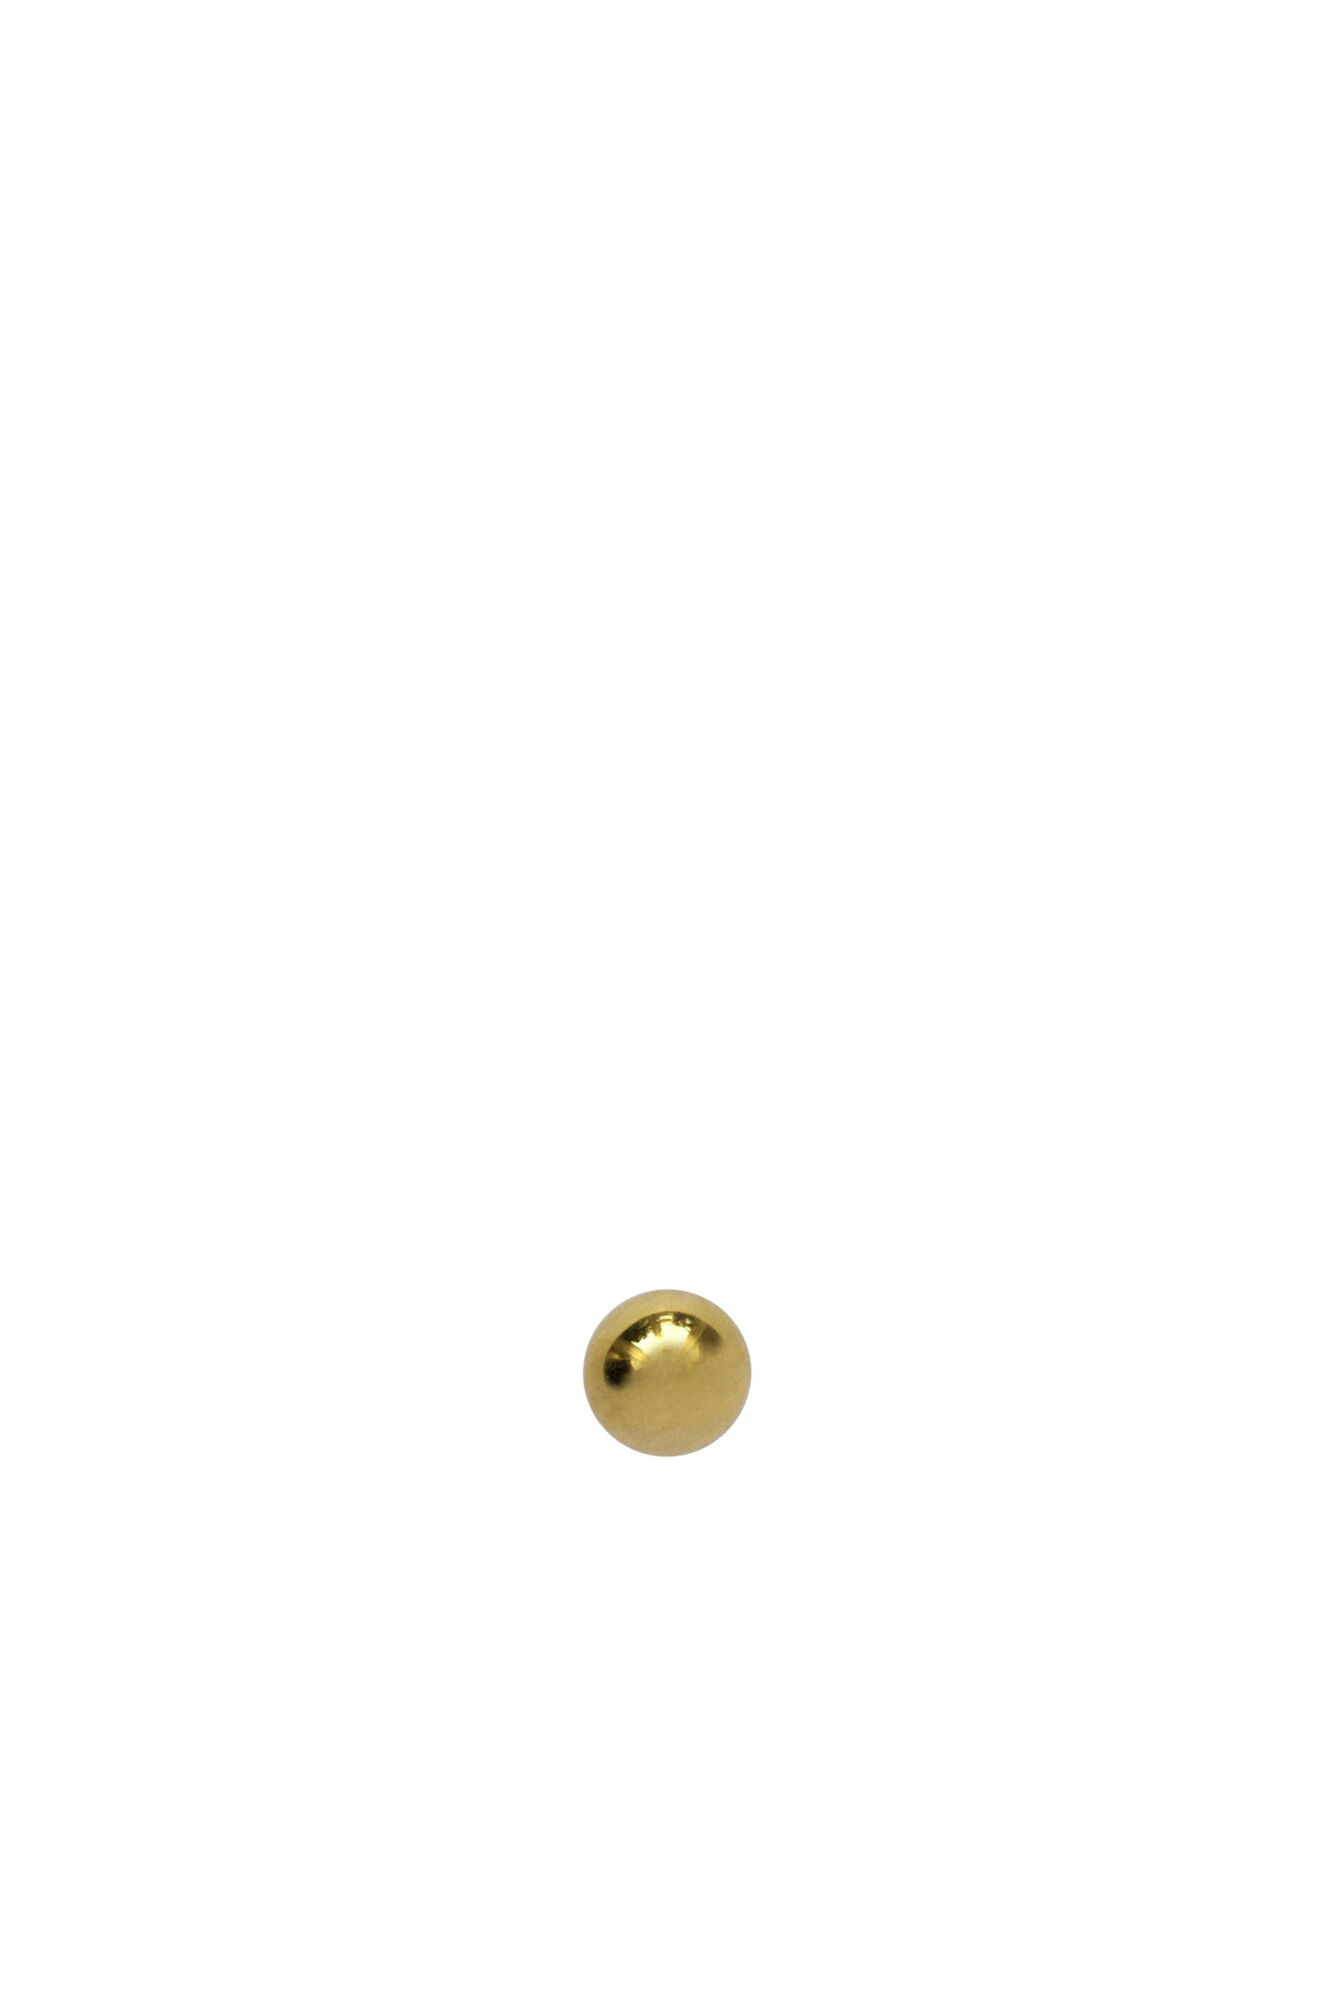 Stars Ear Studs LULUE116, GOLD